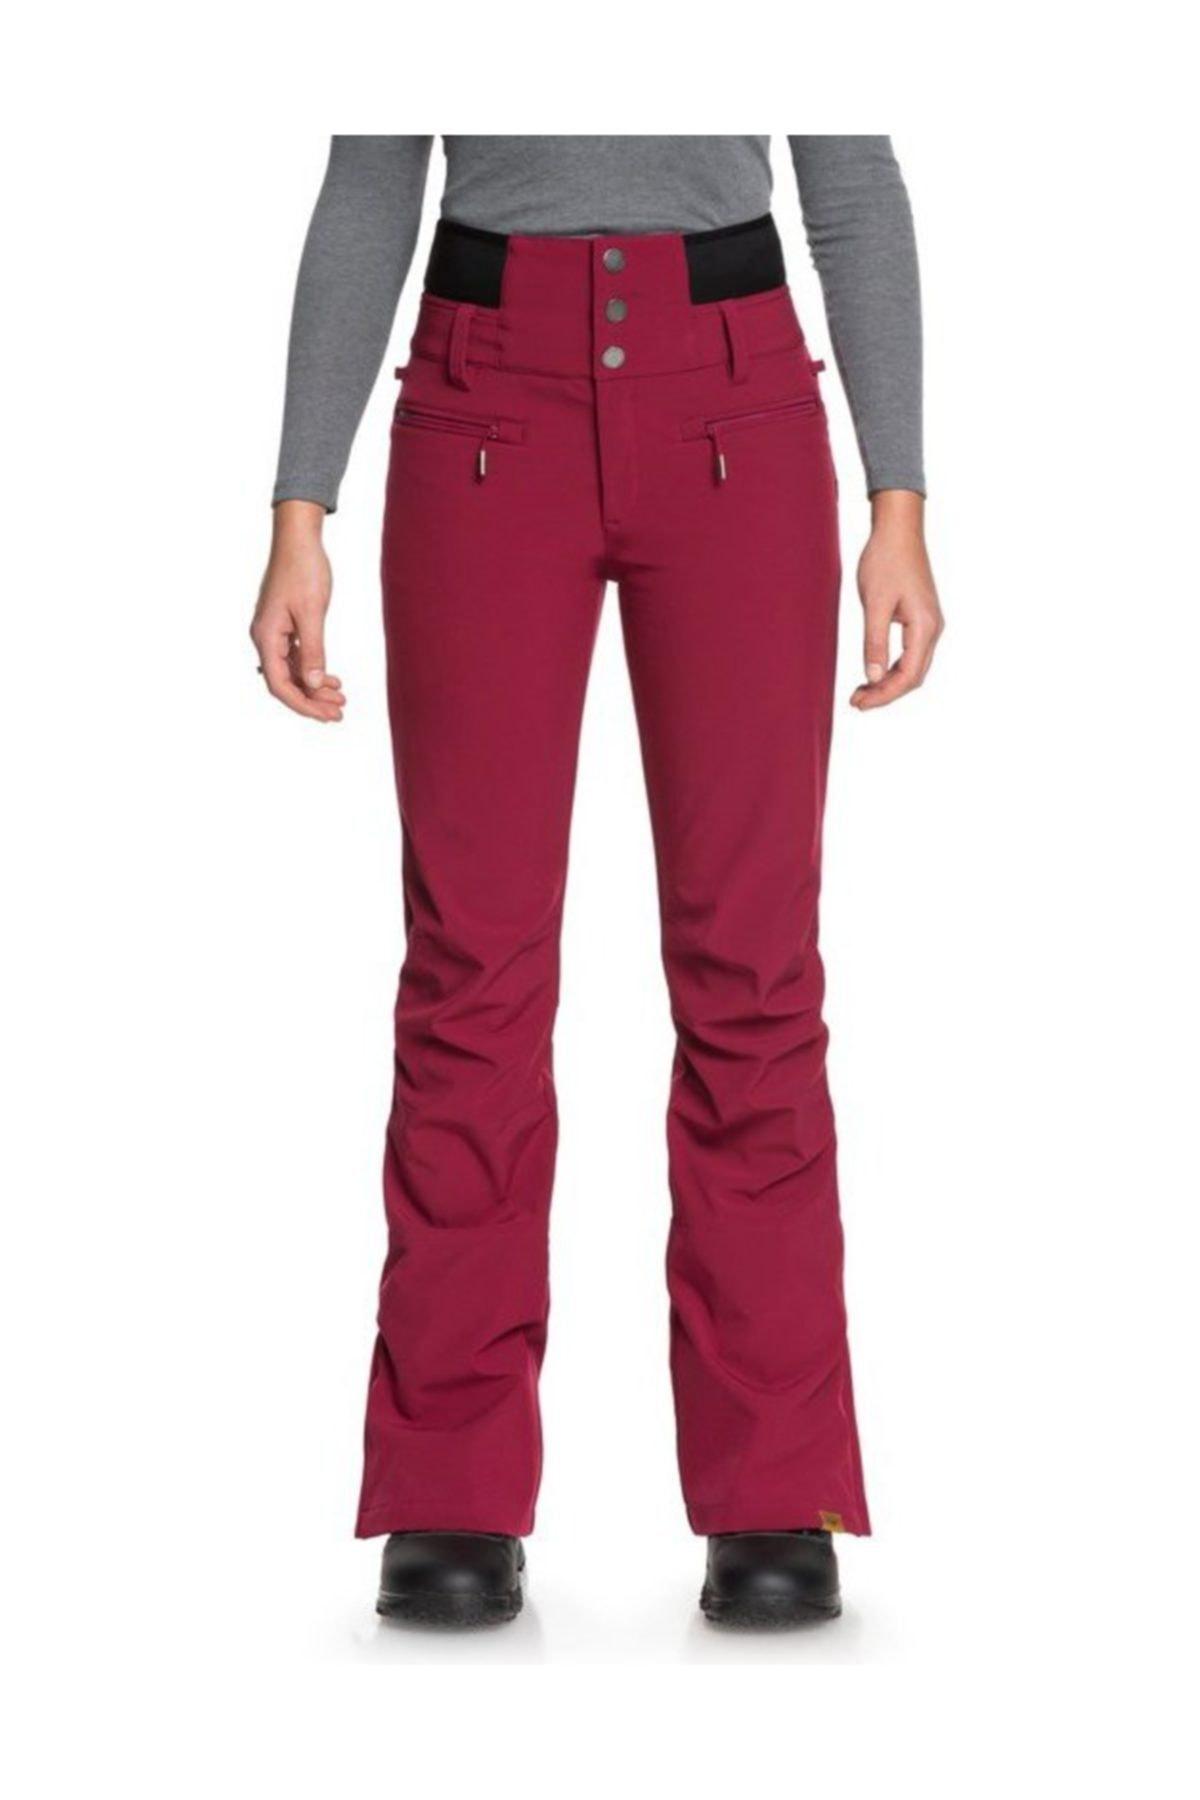 Roxy Rising High Snow Kadın Pantolon ERJTP03067 1